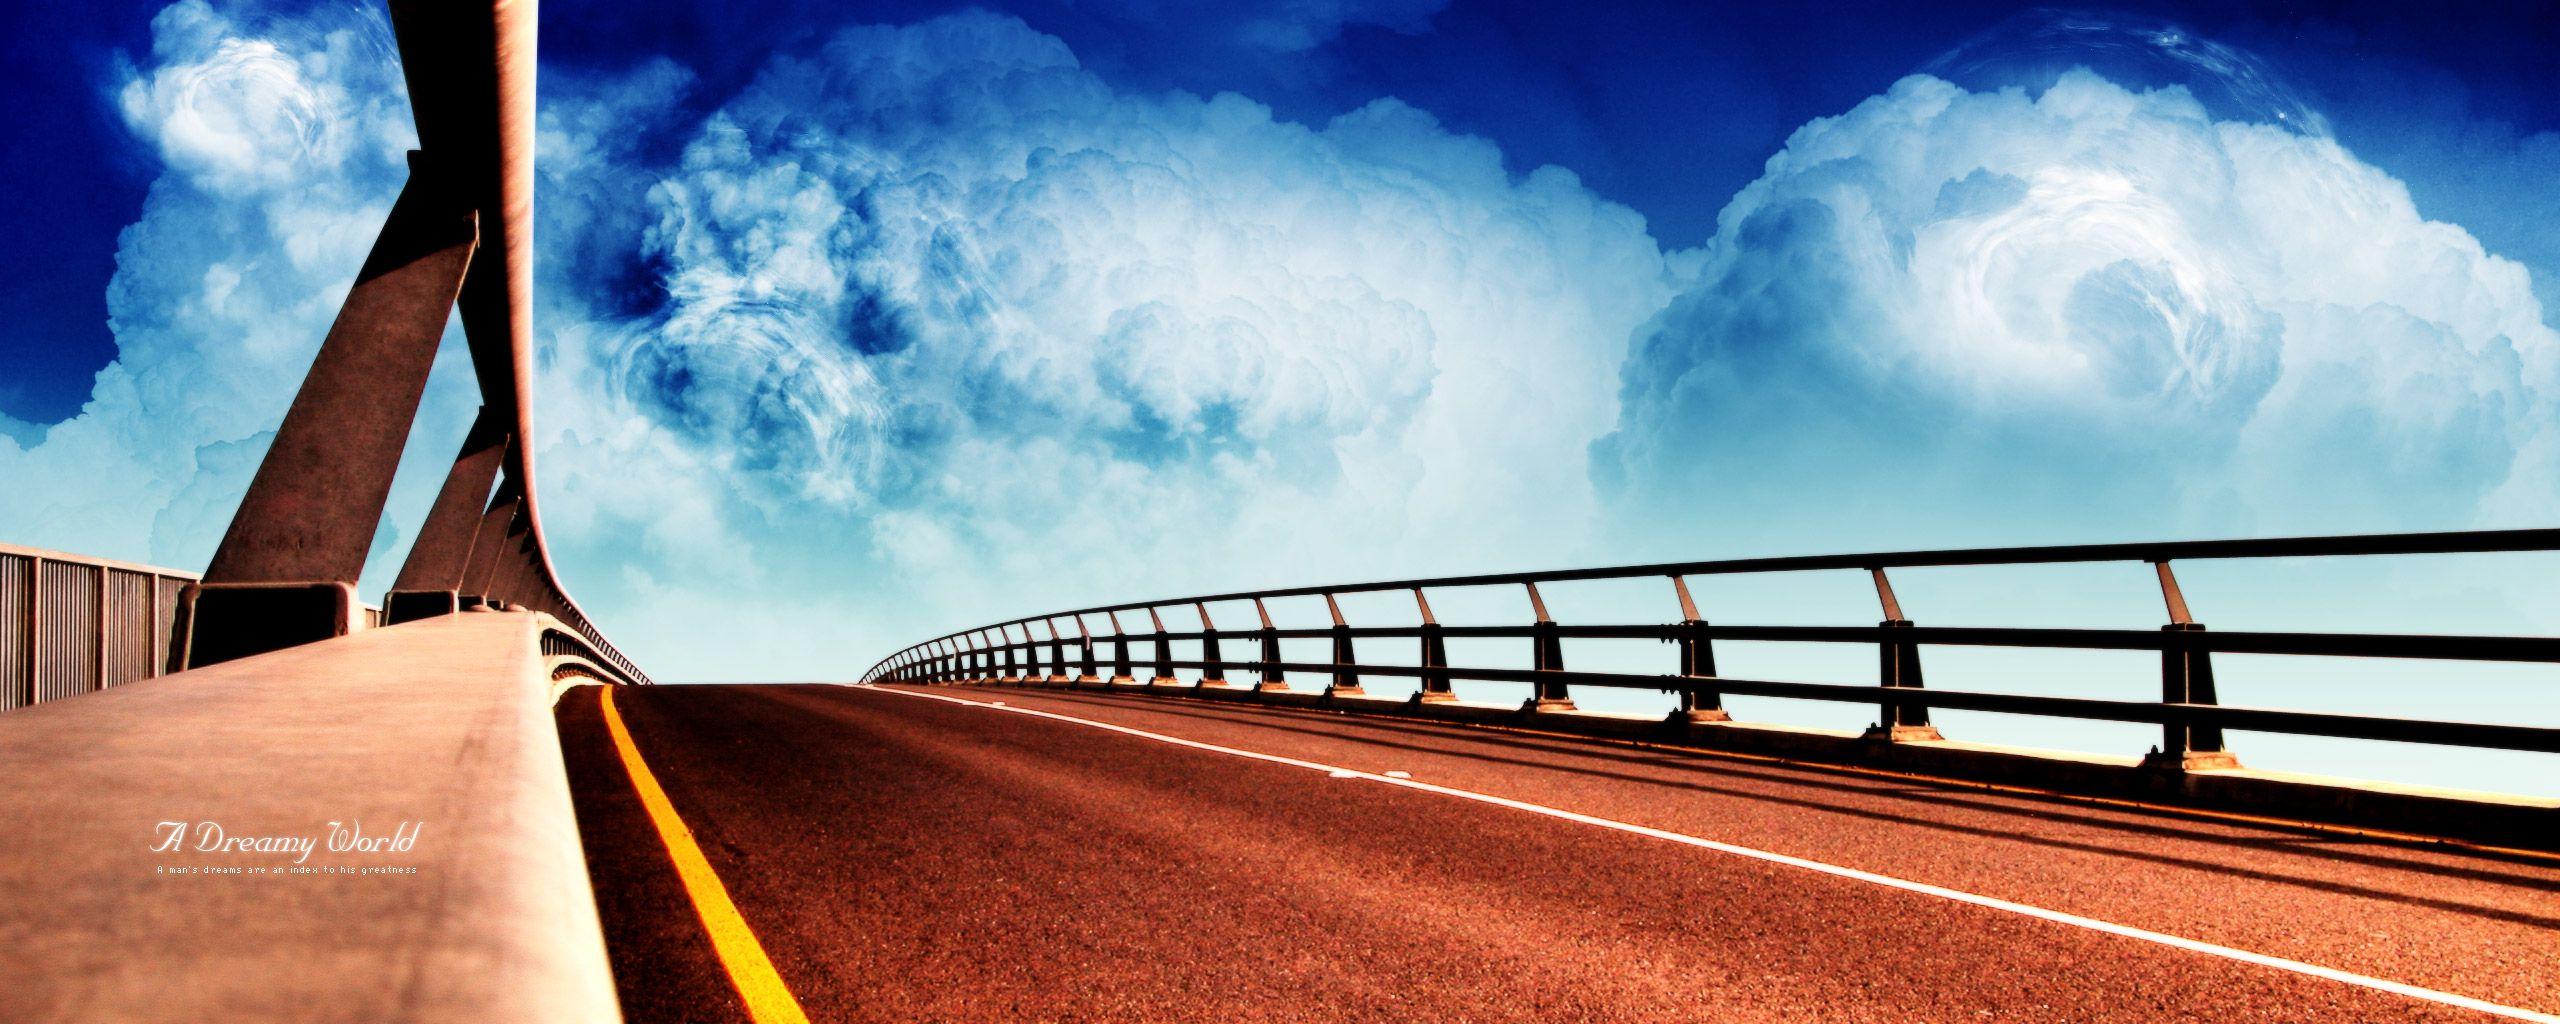 roads_wallpaper4202